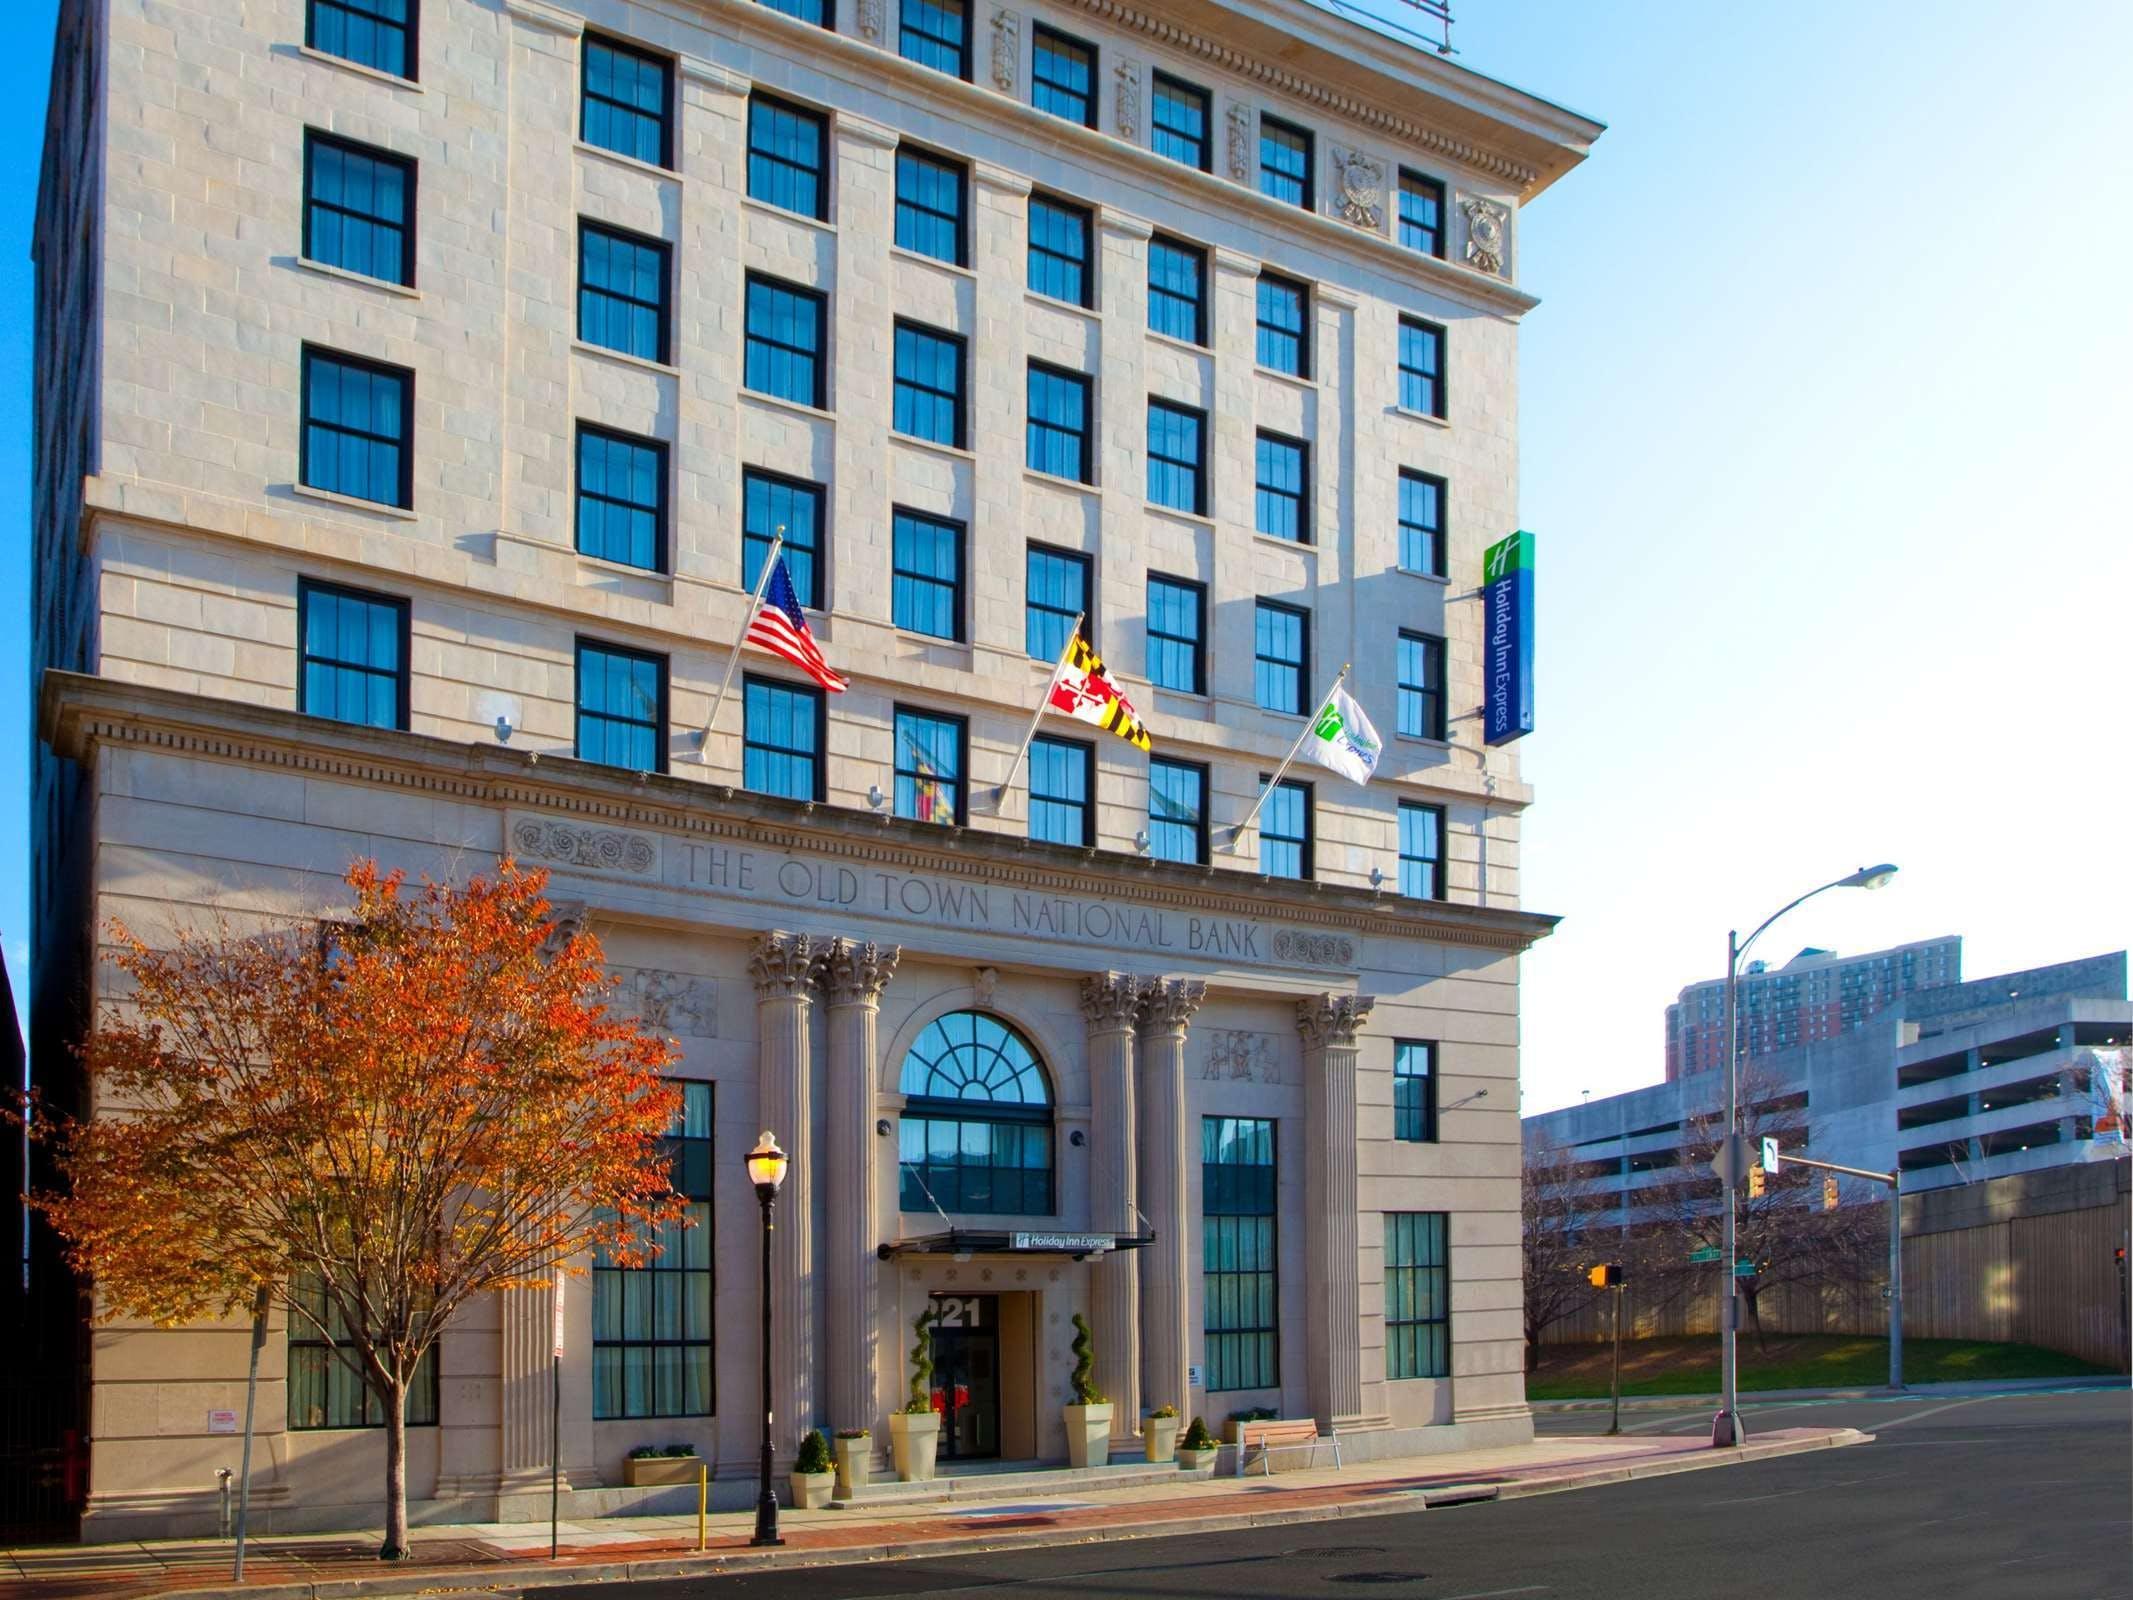 Holiday Inn Express Baltimore Downtown